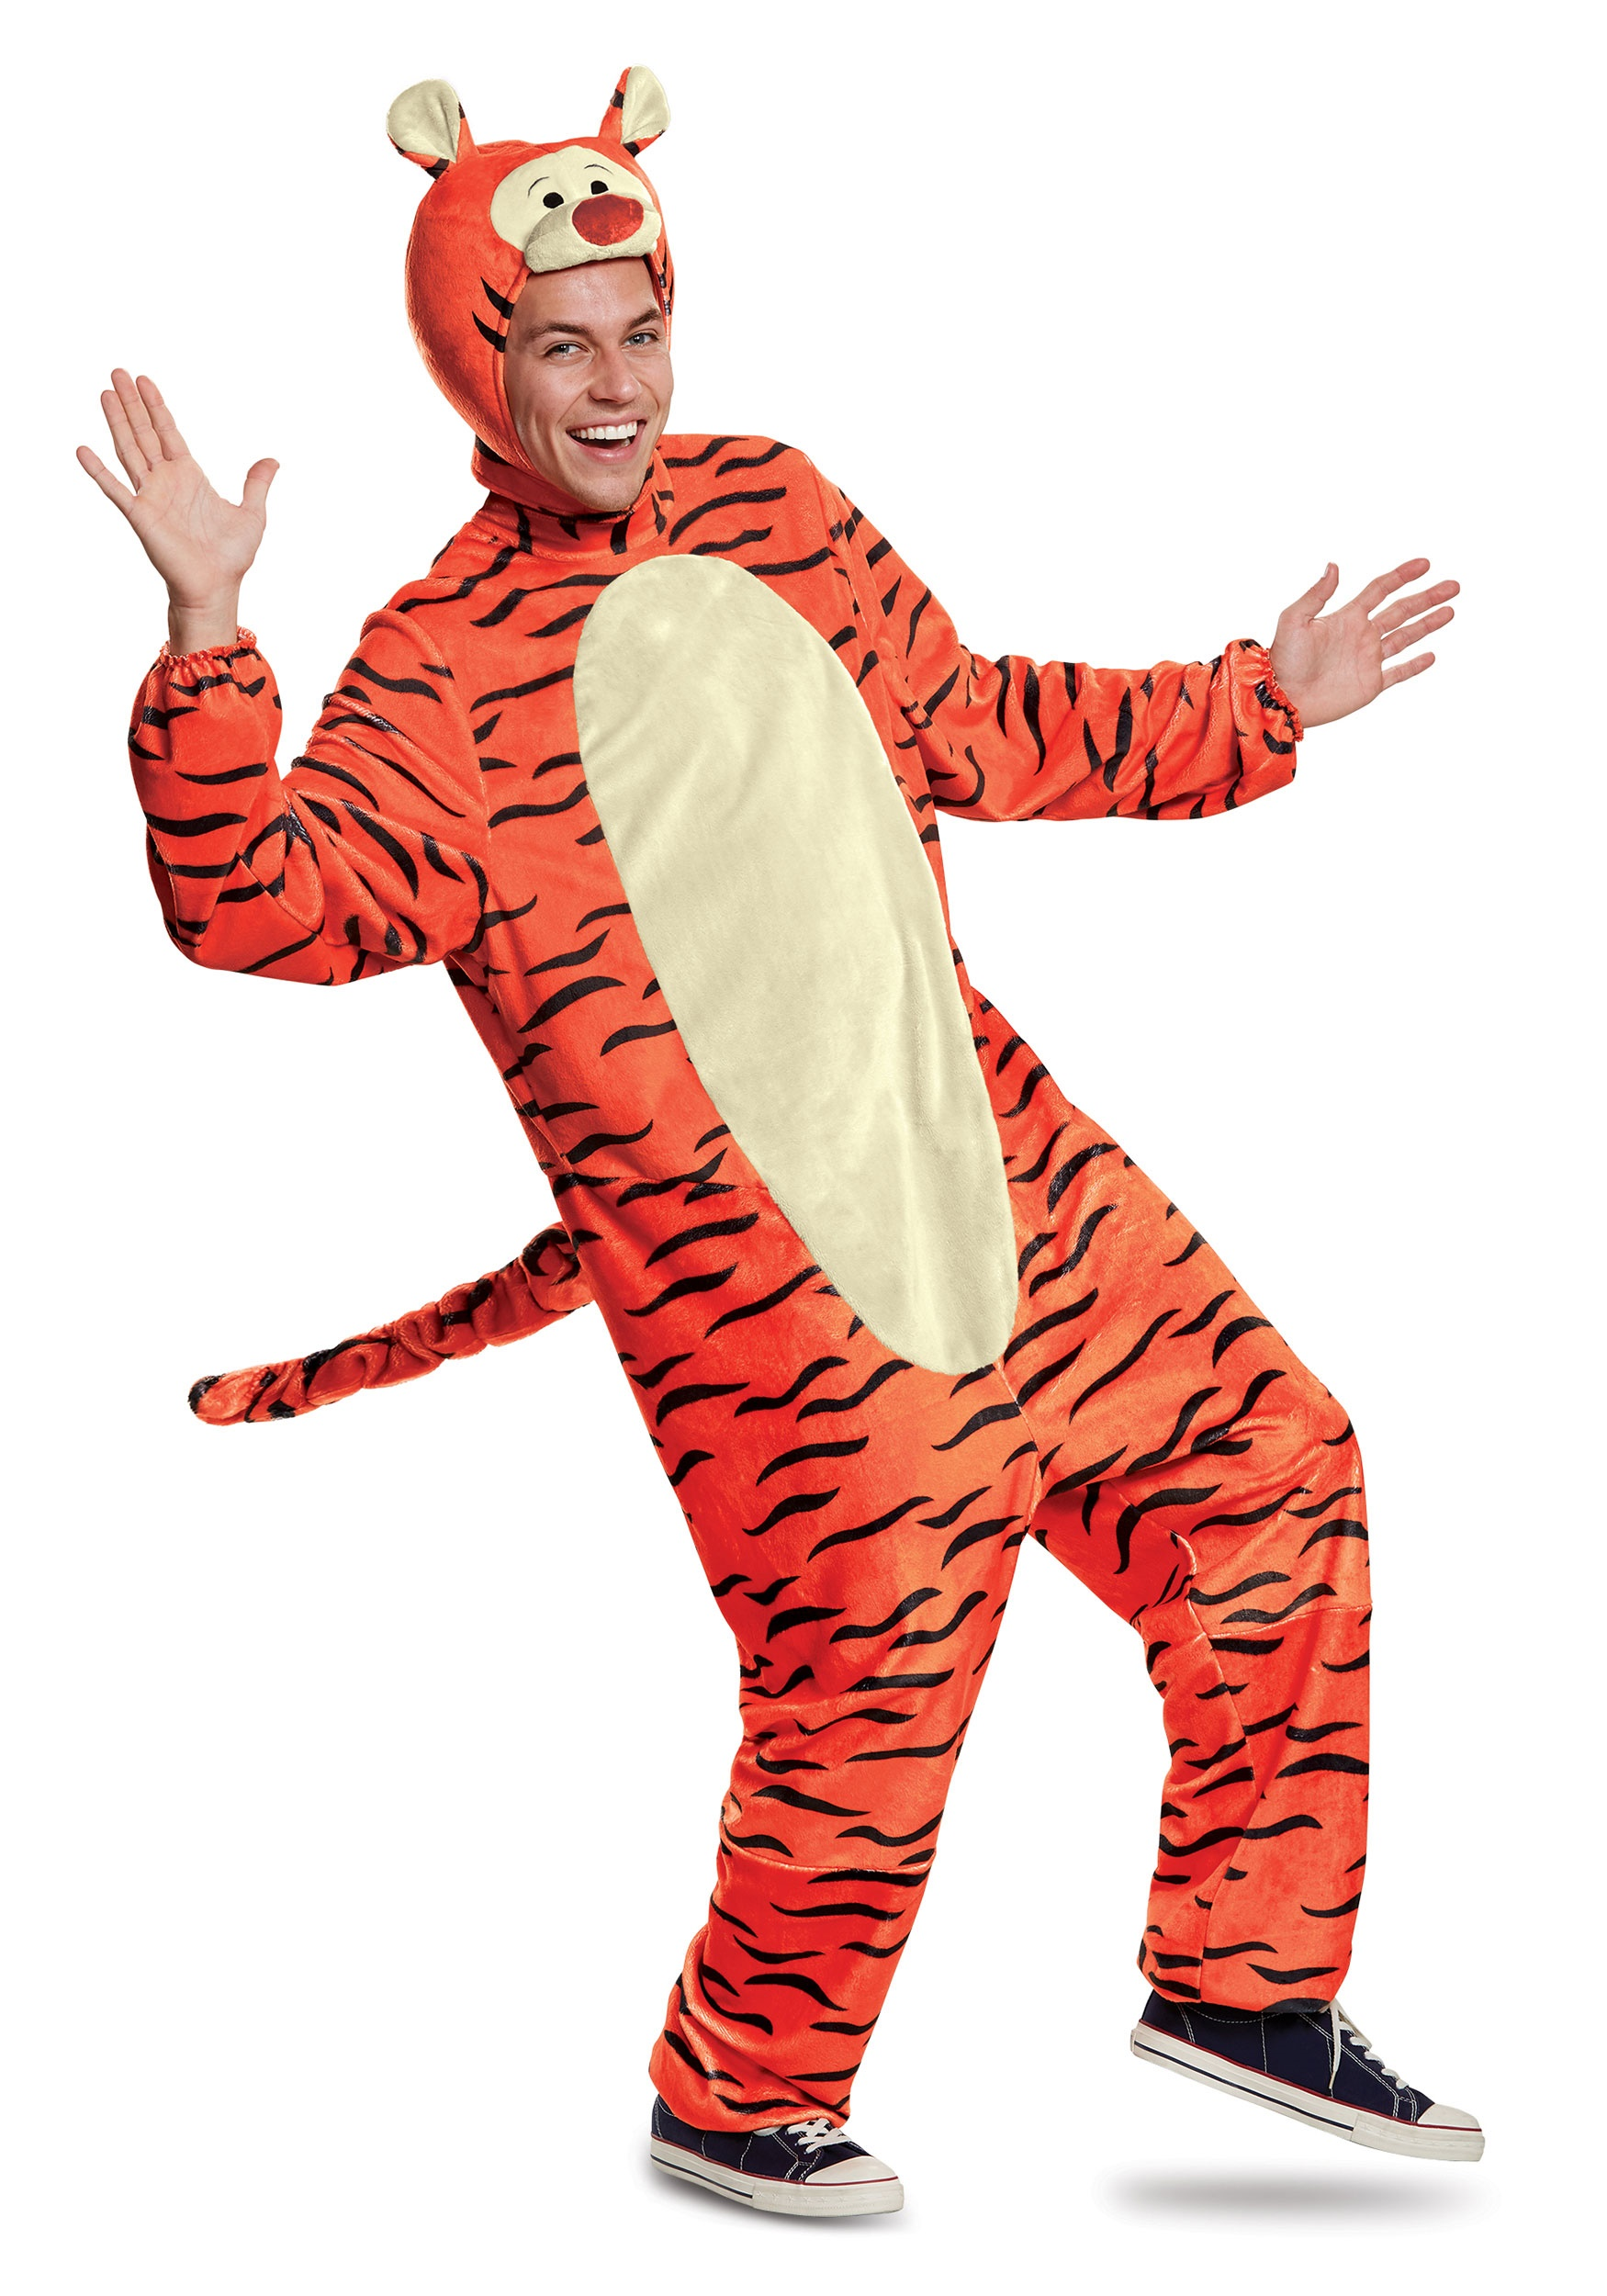 Tigger Deluxe Adult Costume Tigger Deluxe Adult Costume ...  sc 1 st  Halloween Costumes & Adult Tigger Deluxe Costume